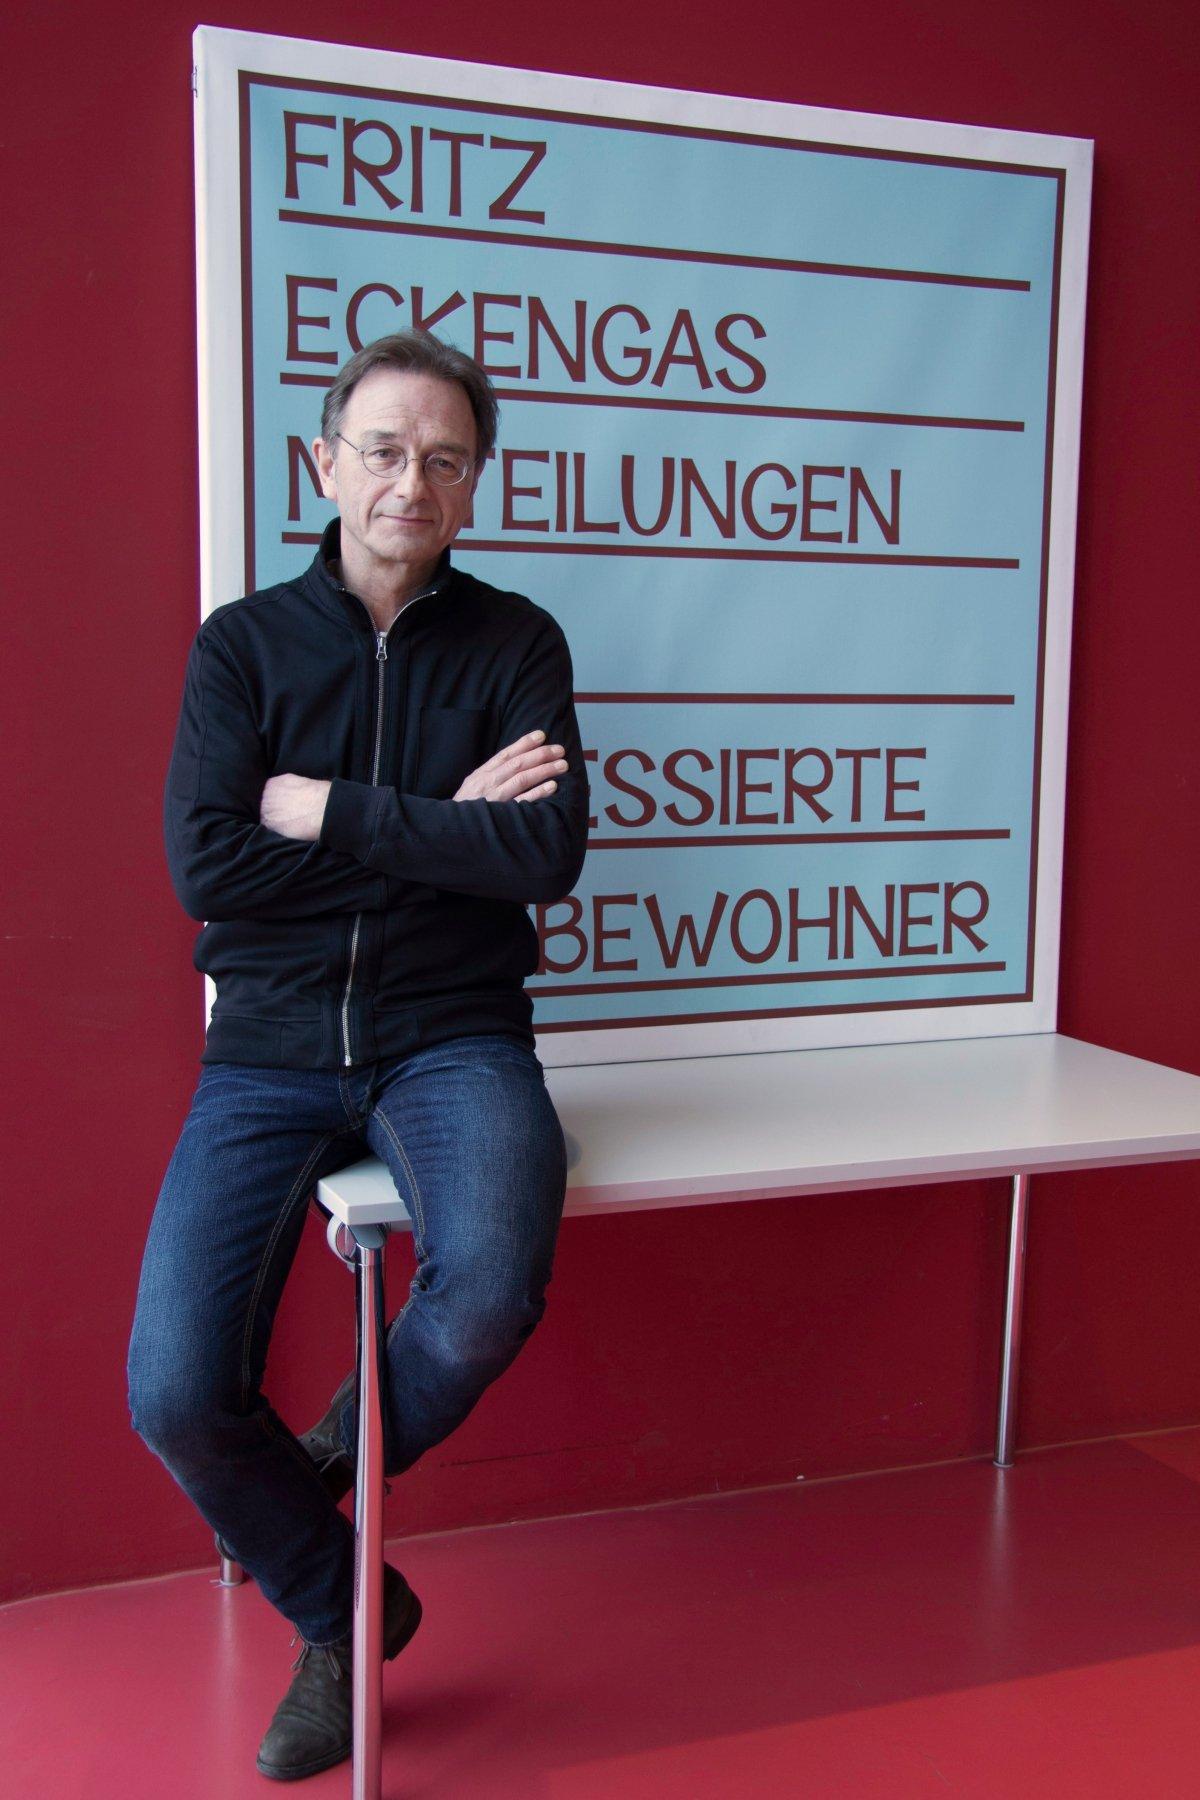 Fritz Eckenga; (Archivfoto: IN-Stadtmagazine)